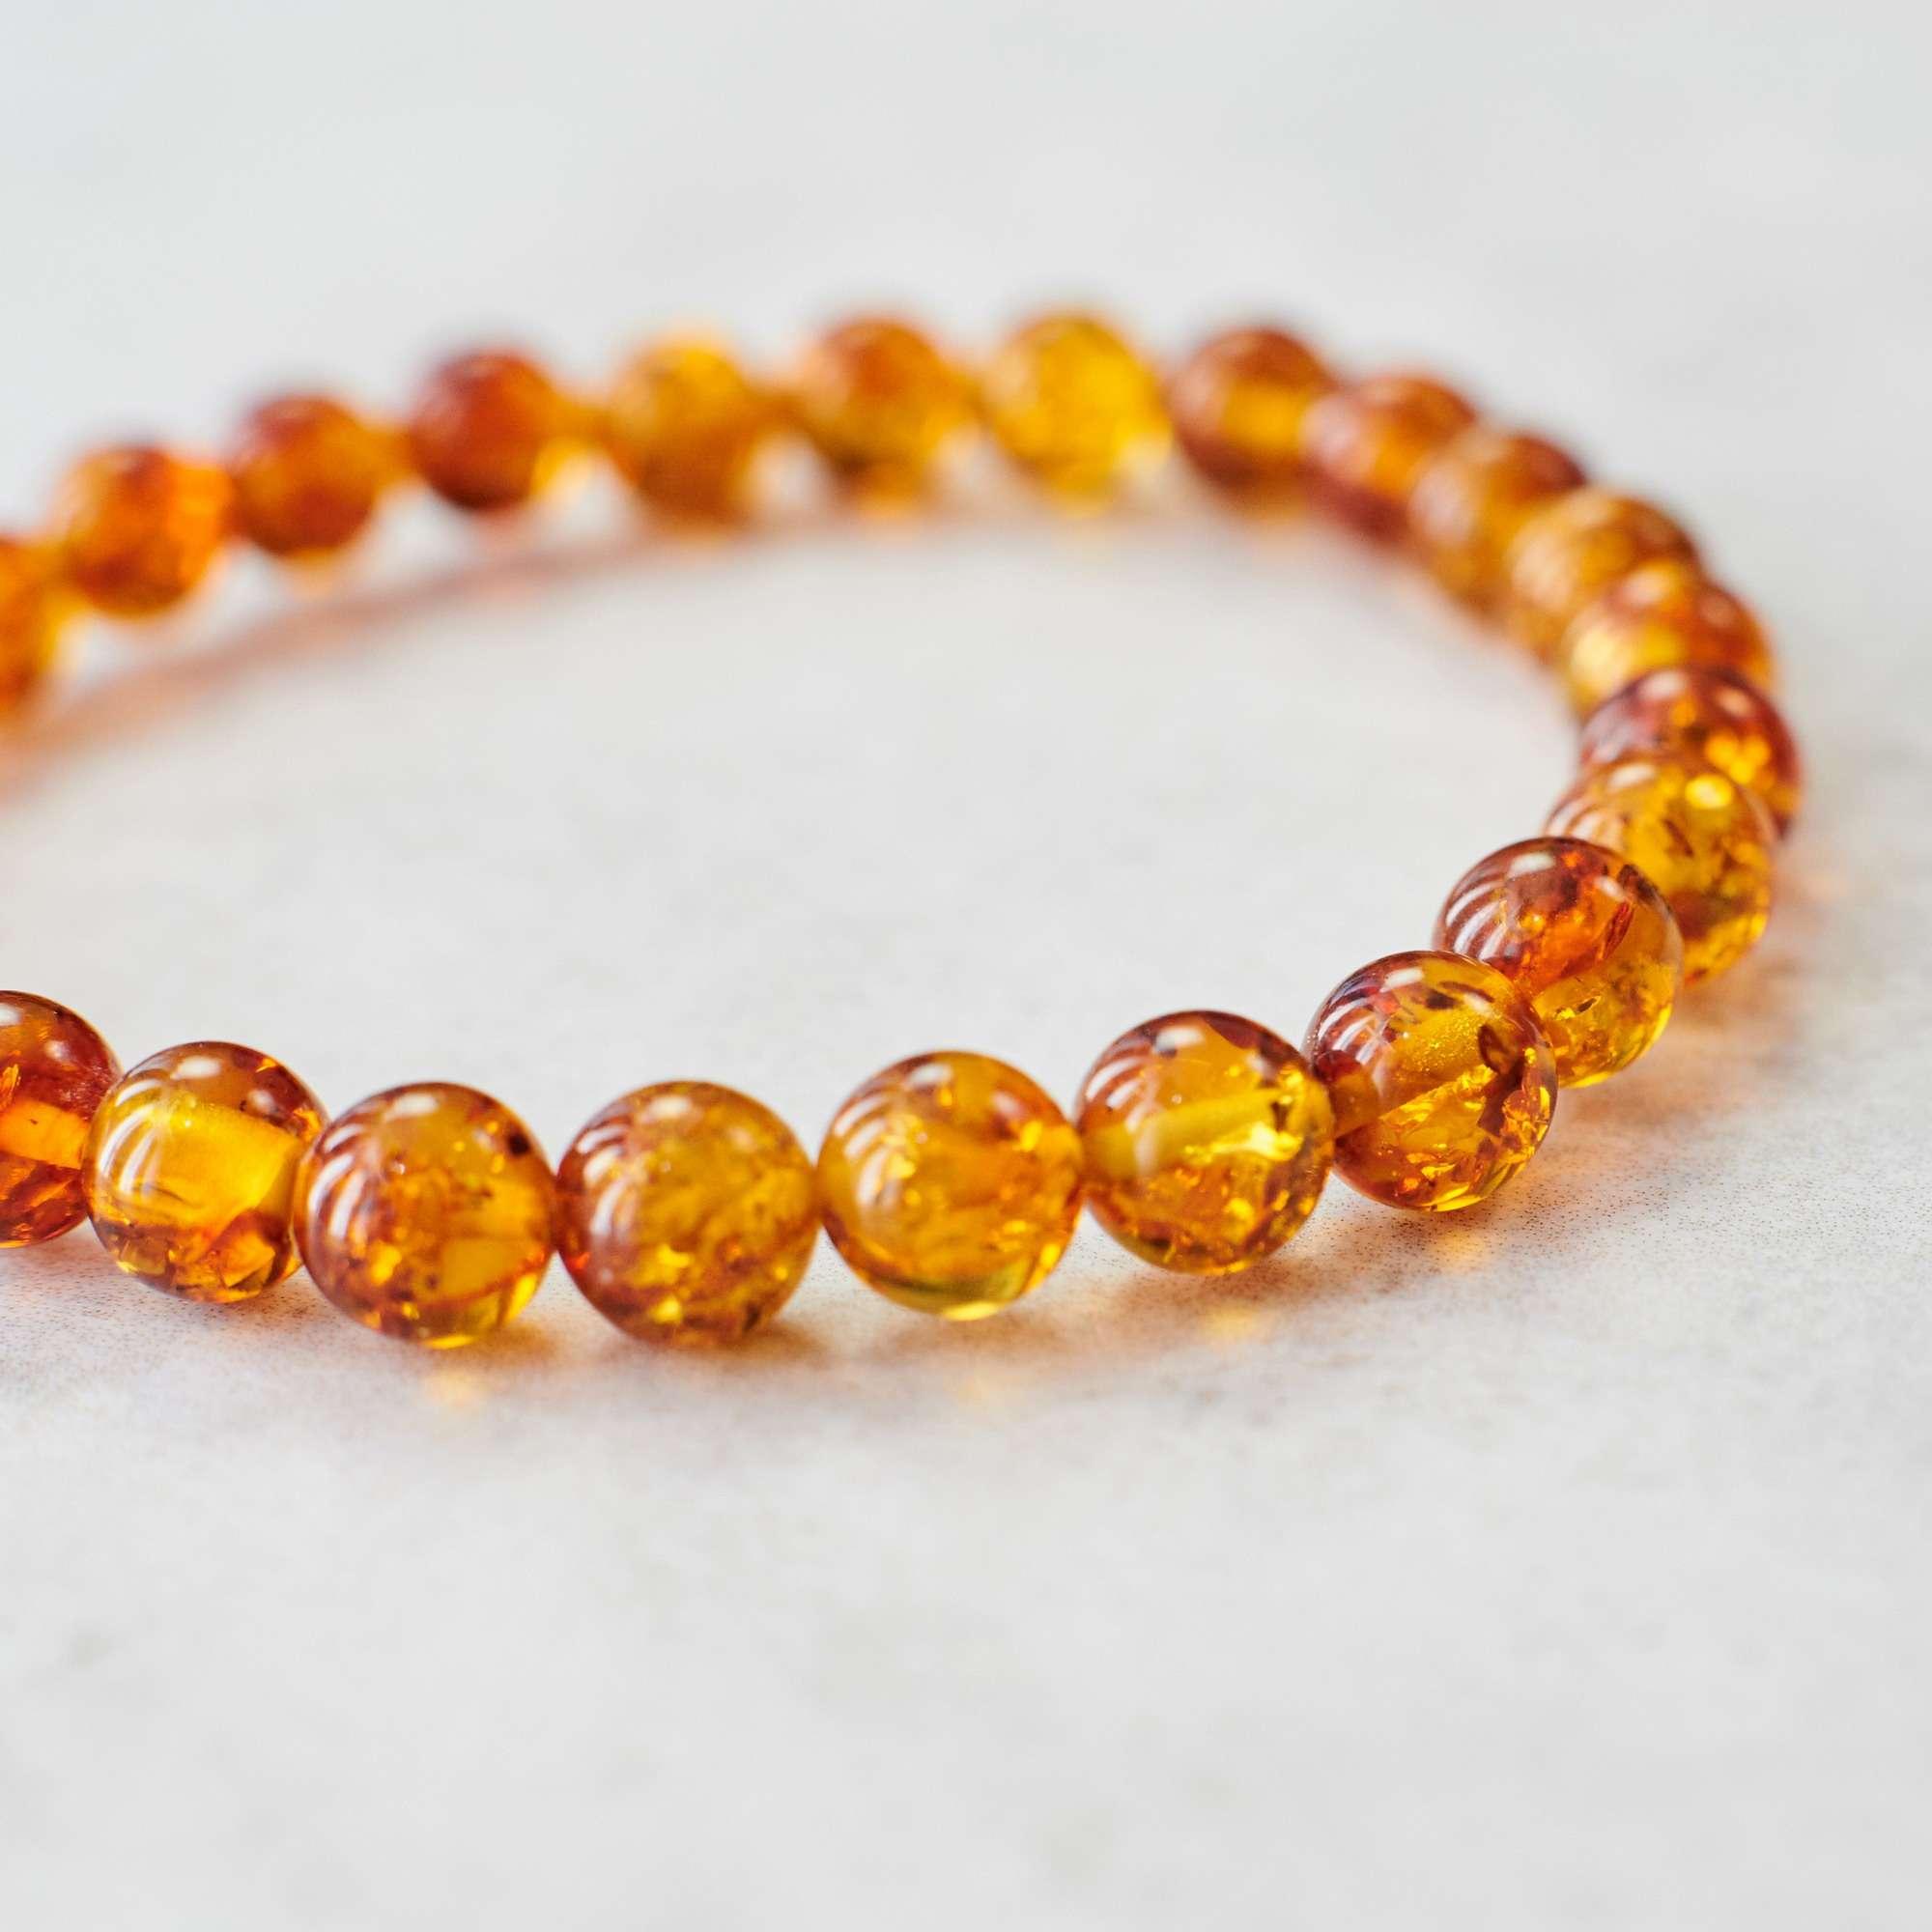 Cognac amber bracelet elegant amber bracelet cognac amber beads cognac color beads stretchy bracelet royal amber amber jewelry